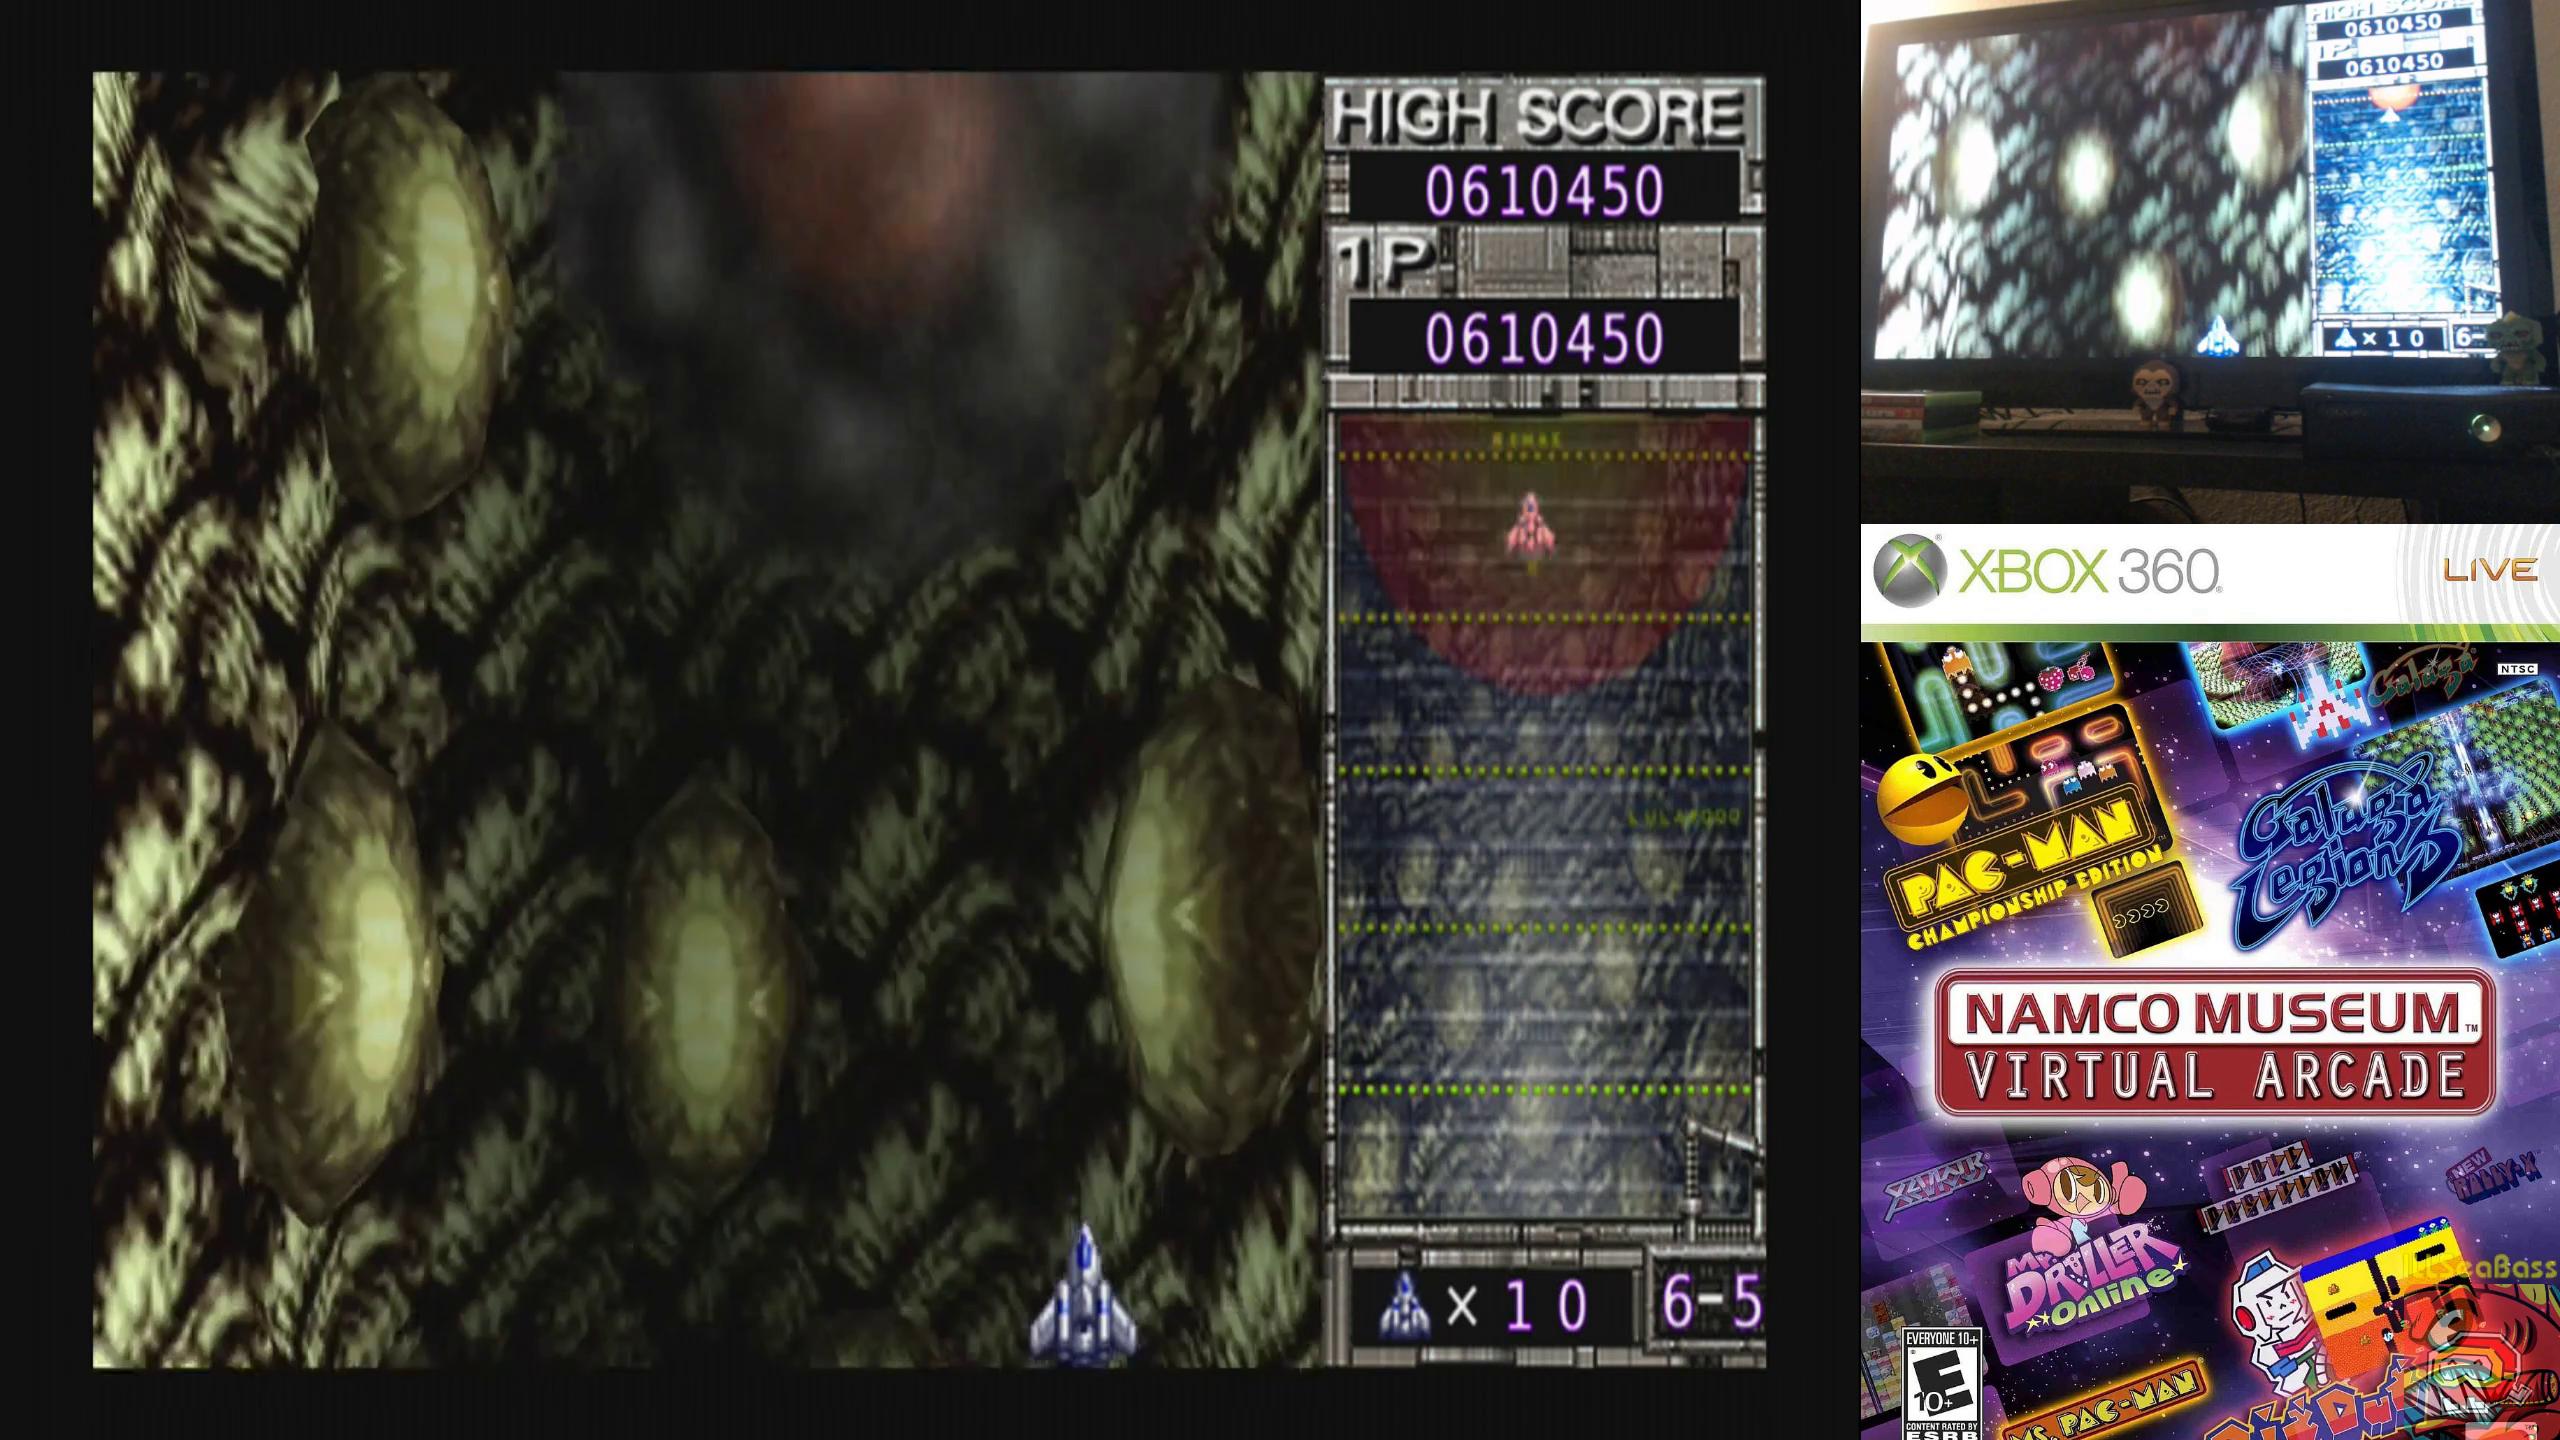 ILLSeaBass: Namco Muesum Virtual Arcade: Galaga Arrangement (Xbox 360) 610,450 points on 2019-10-03 22:09:57